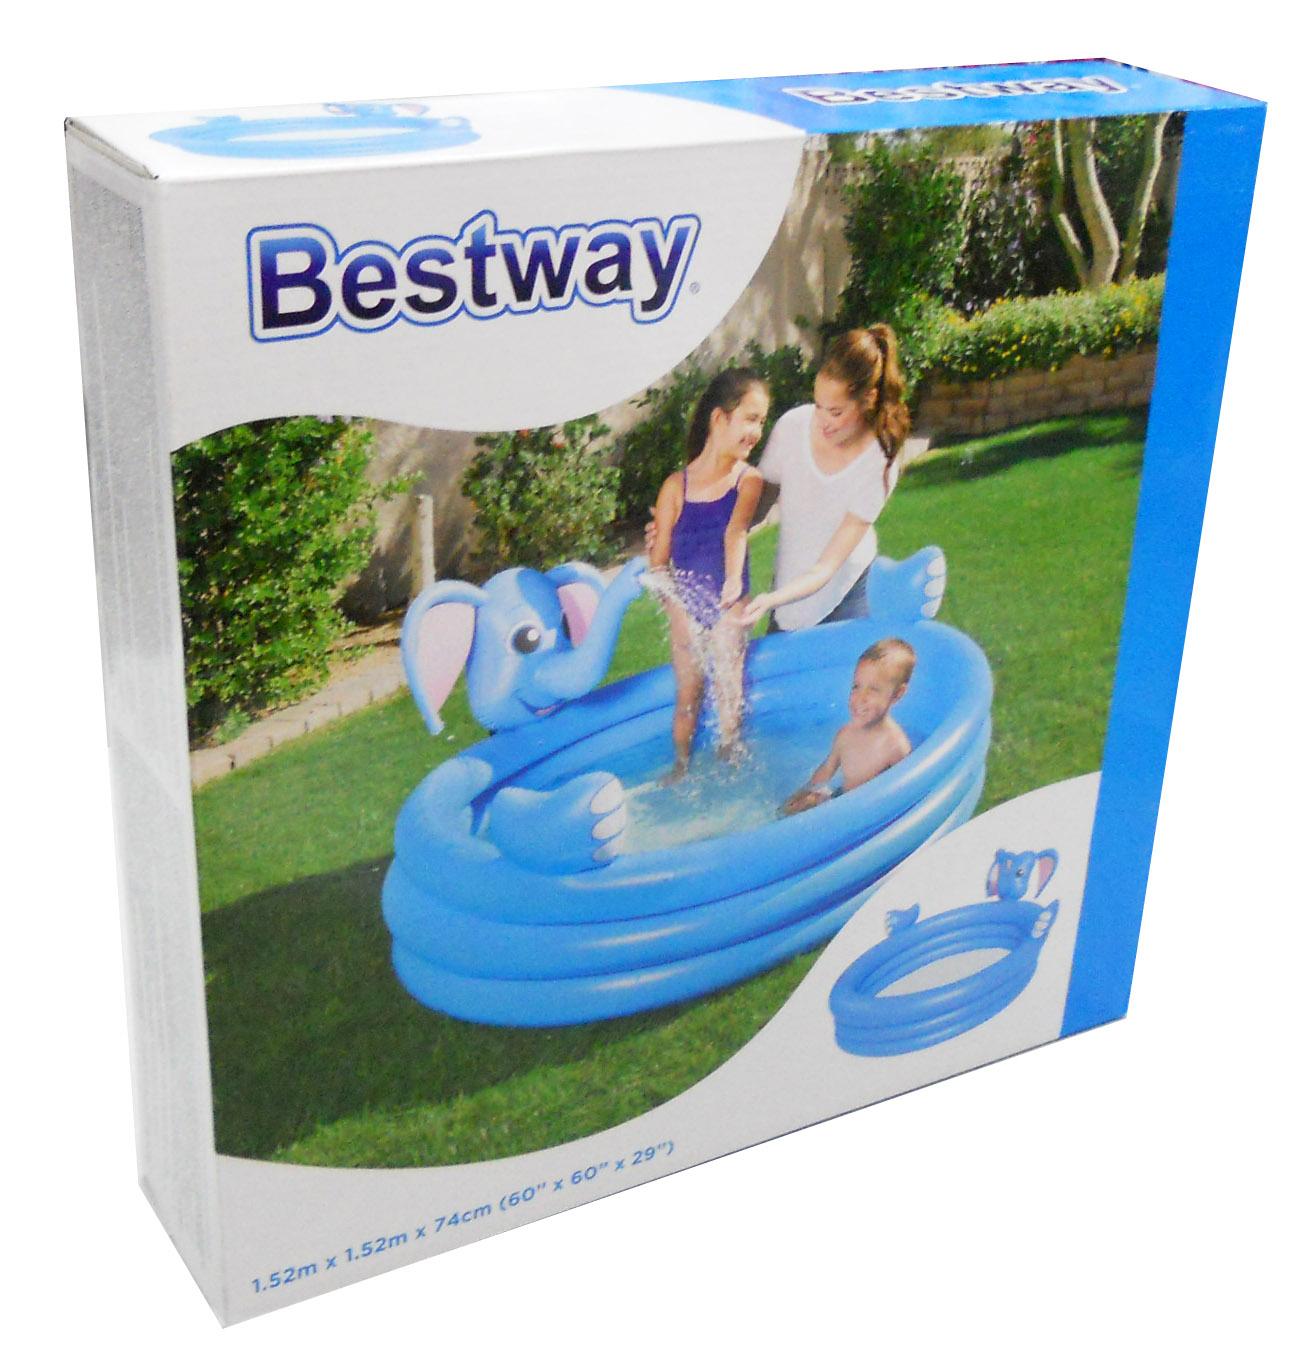 Bongbongidea Bestway Splash And Play Inflatable Pool For